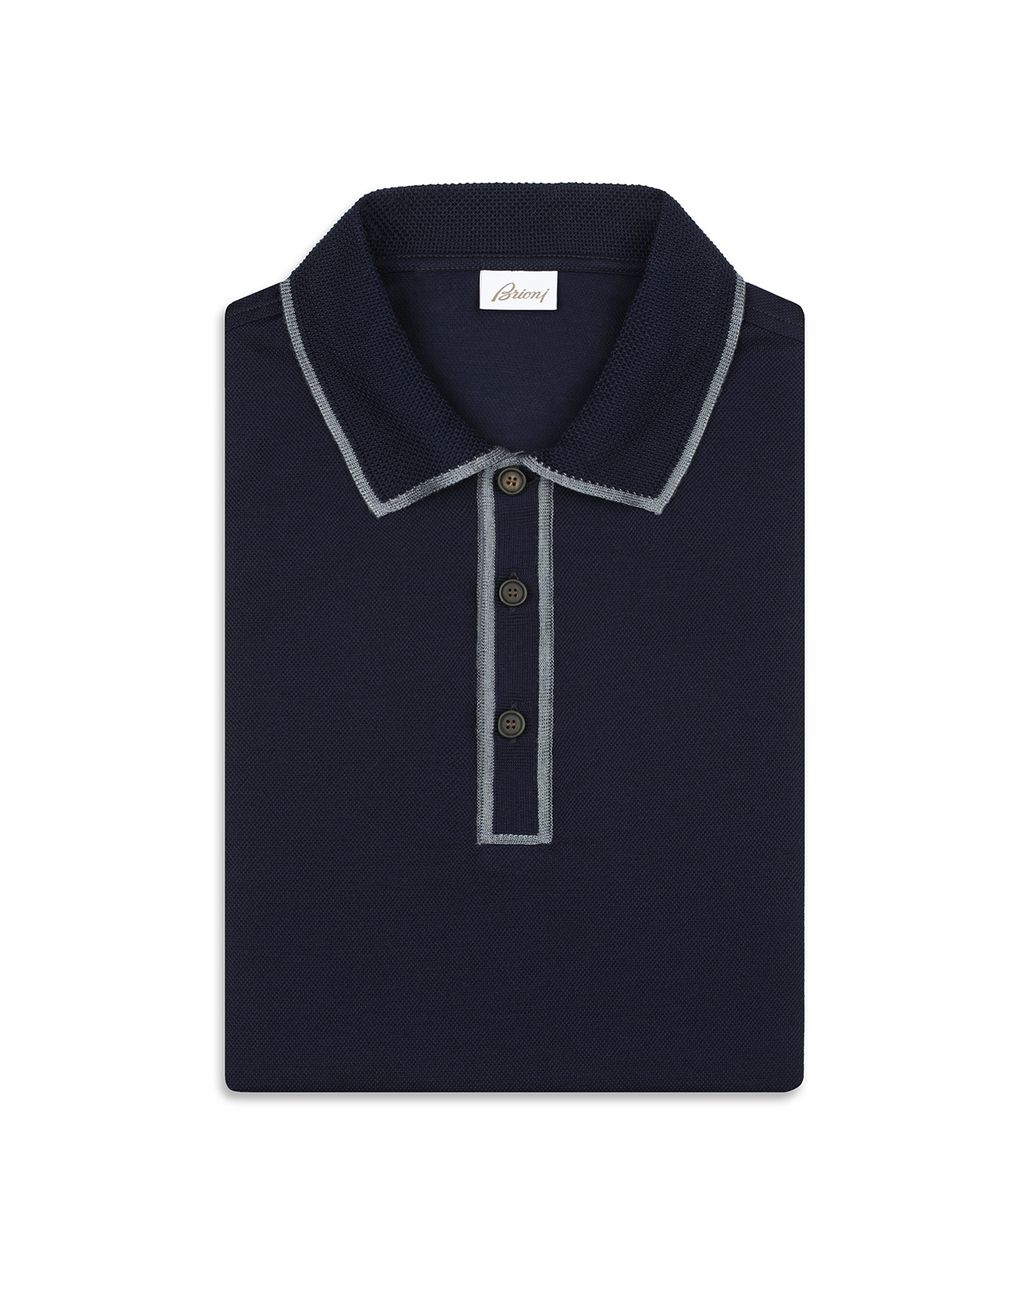 BRIONI Navy Blue Piquet Polo Shirt T-Shirts & Polos [*** pickupInStoreShippingNotGuaranteed_info ***] e